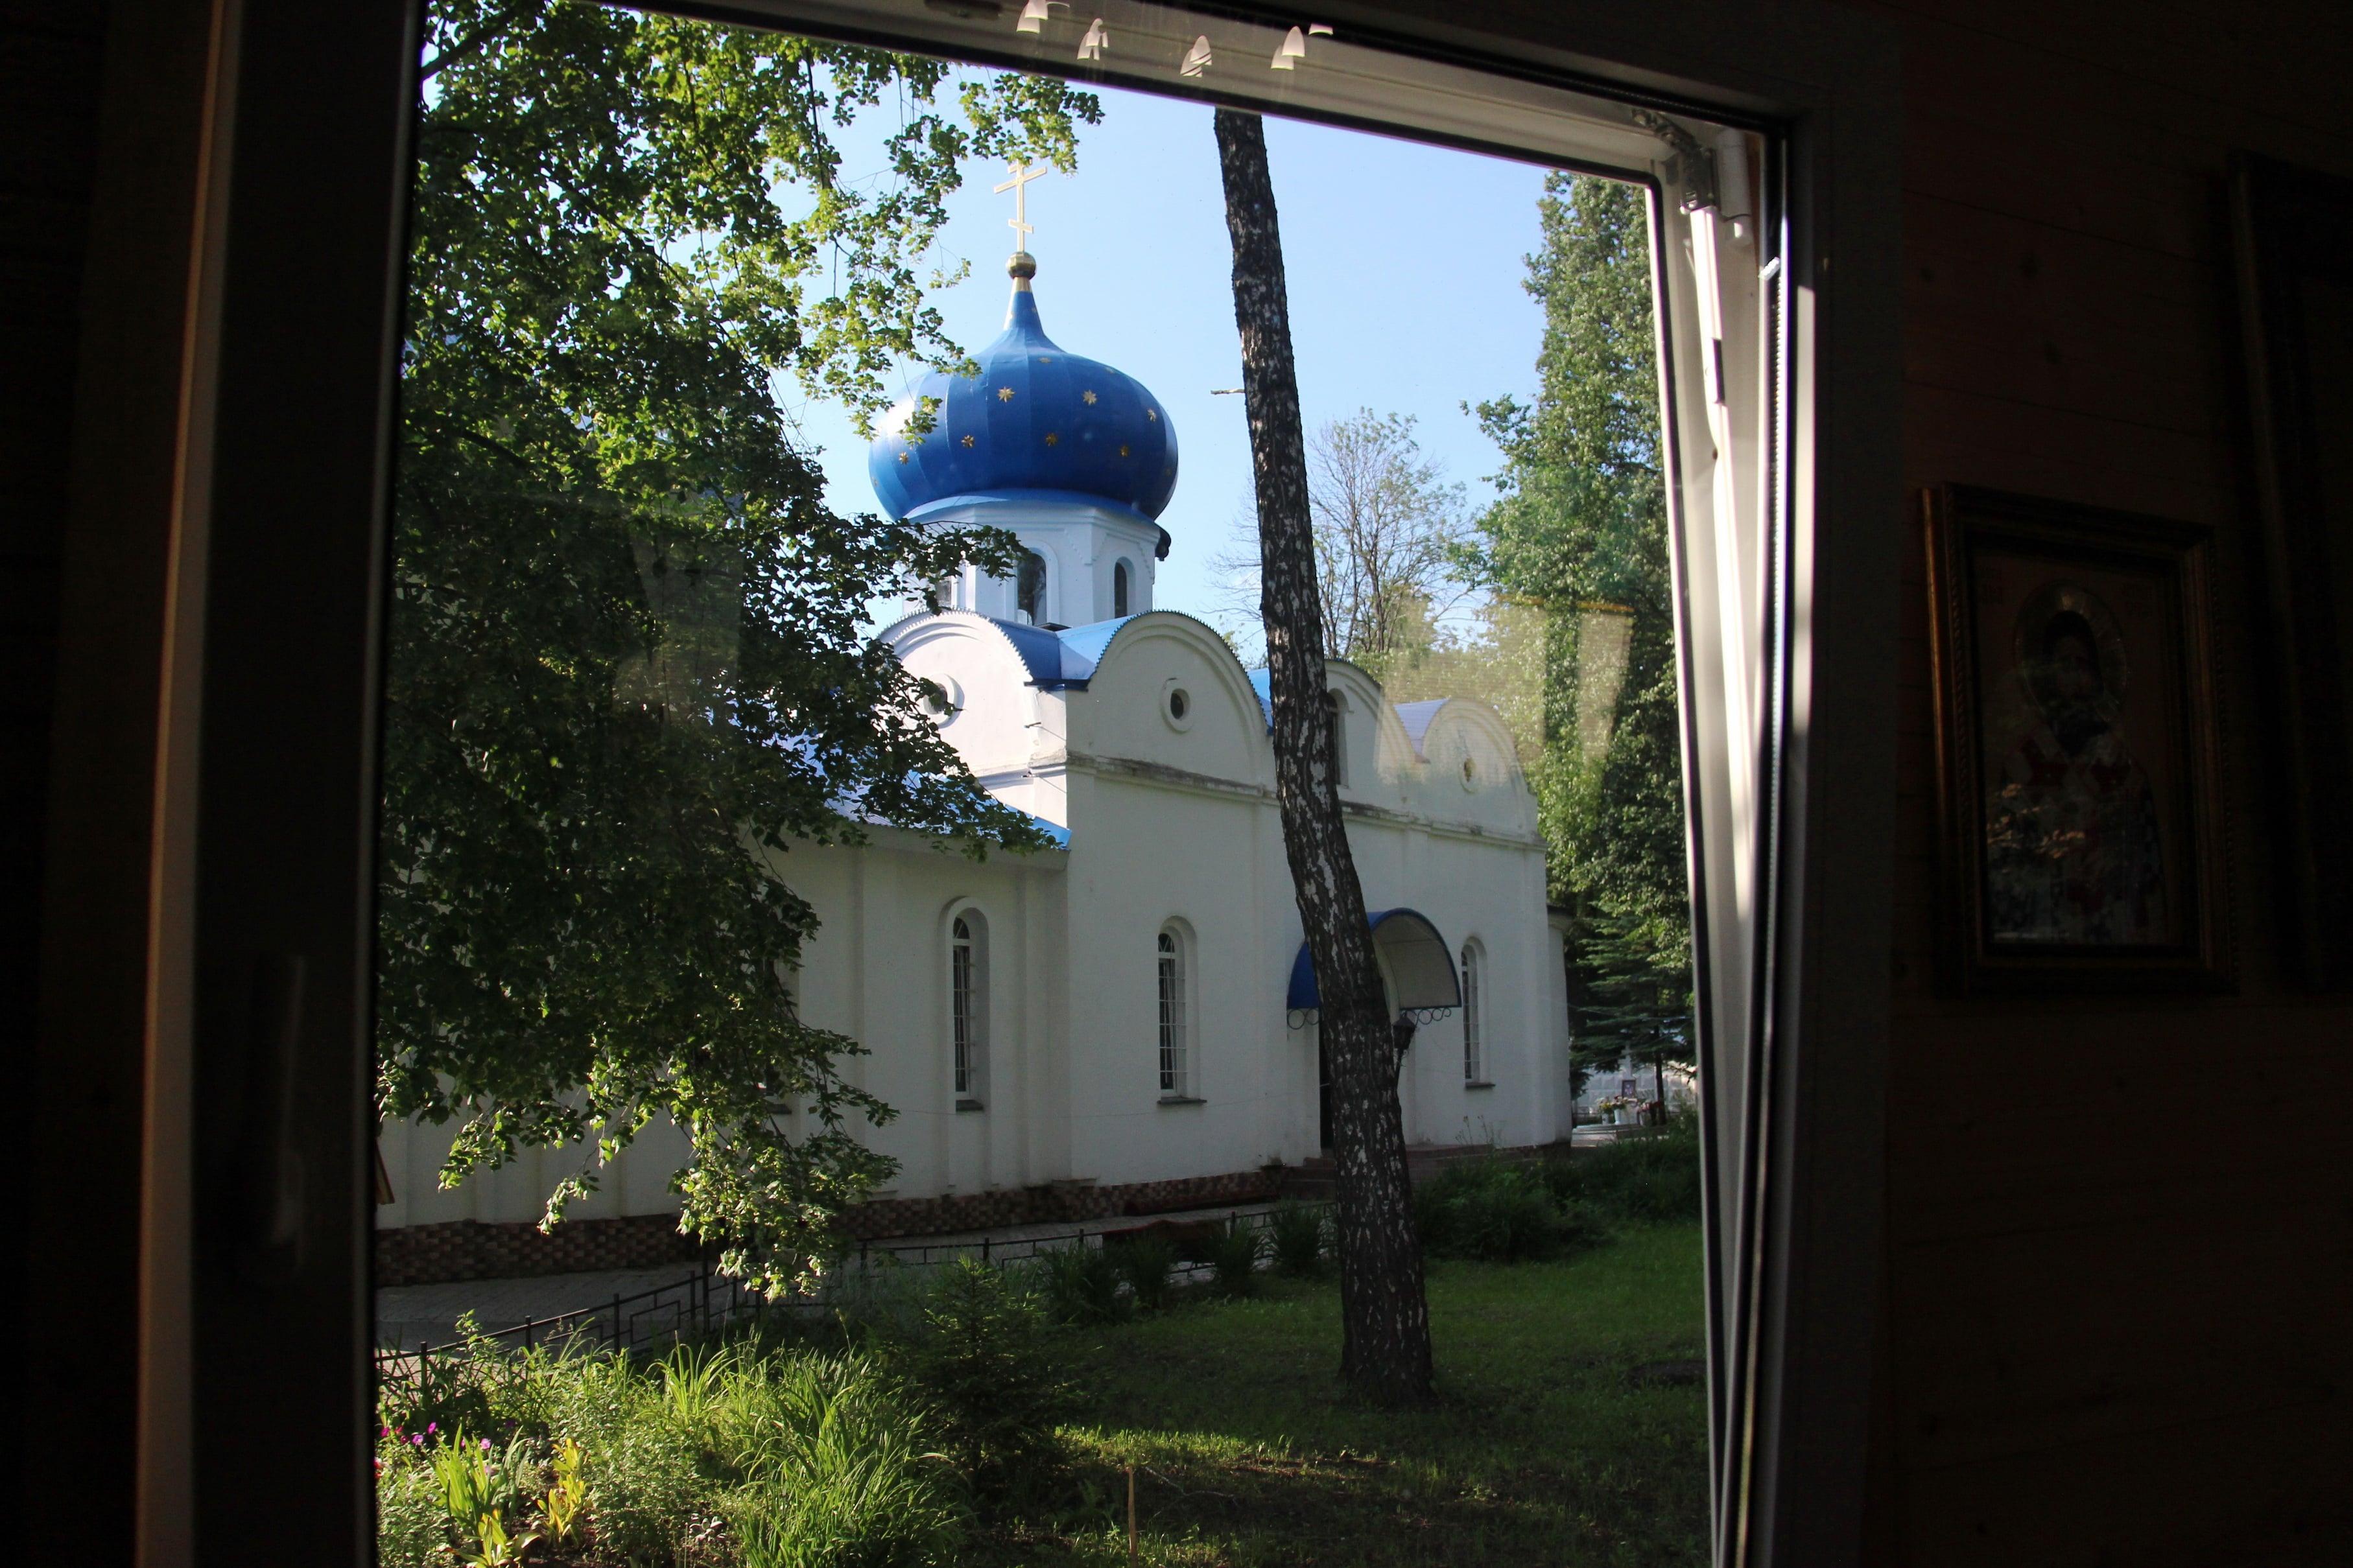 http://monuspen.ru/photoreports/9d553e3cea426a8390cd62a5f8fa5g06.JPG